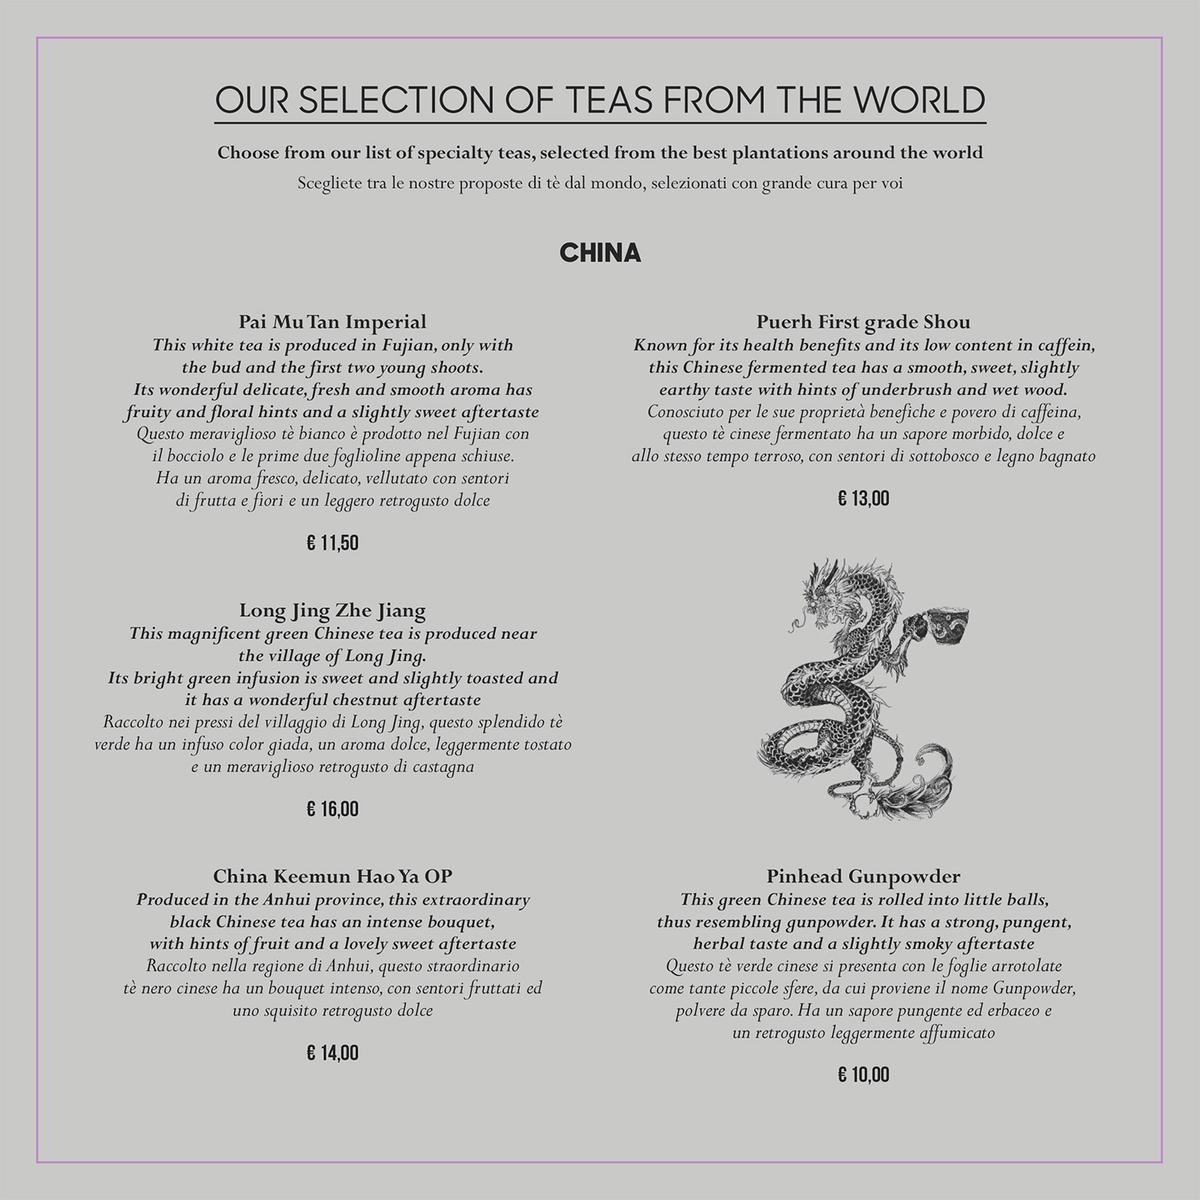 Lista dei tè